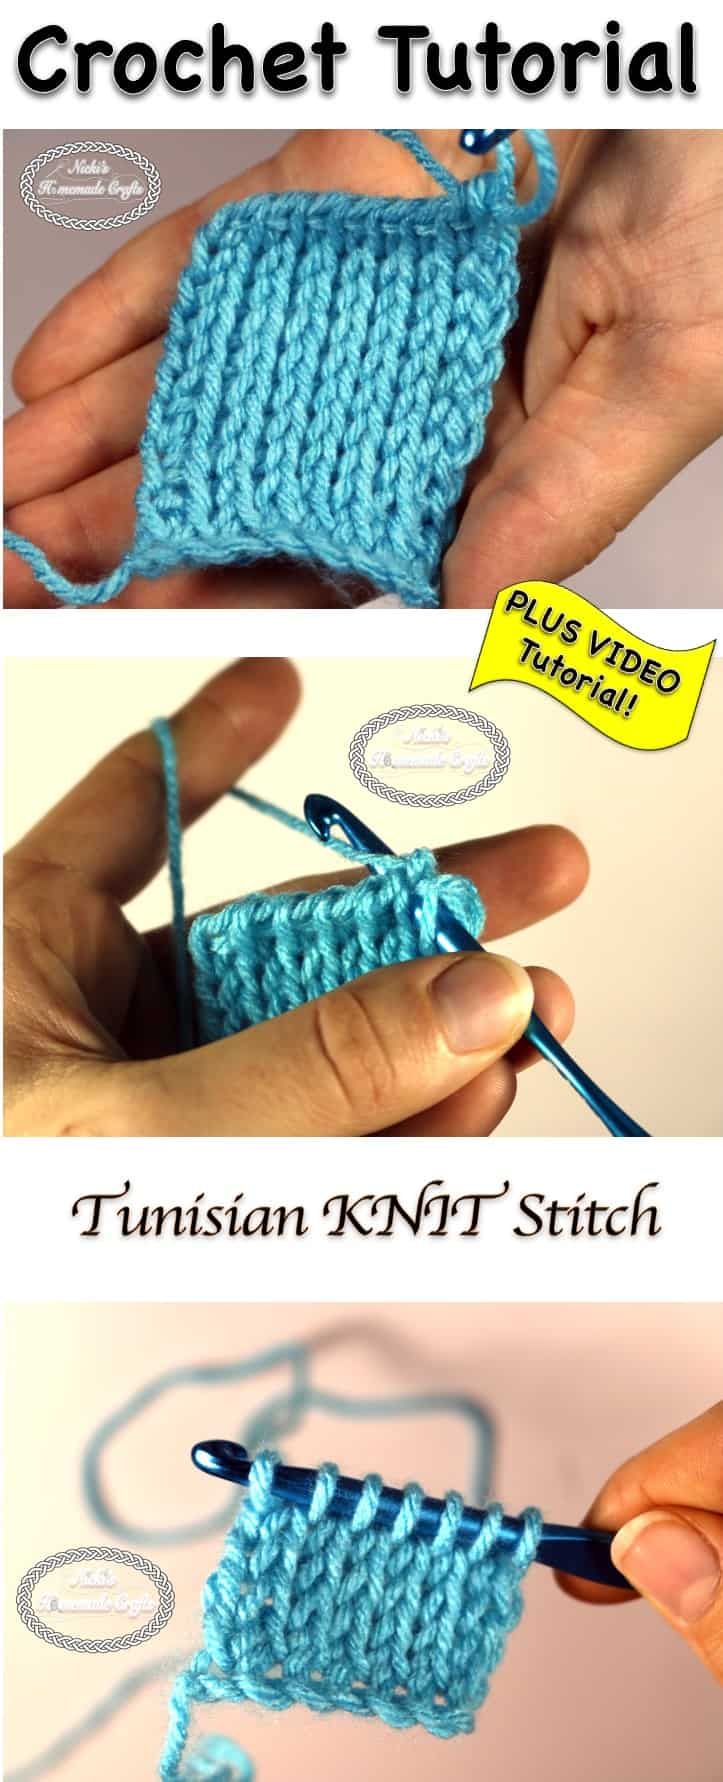 Tunisian Knit Stitch Crochet Tutorial